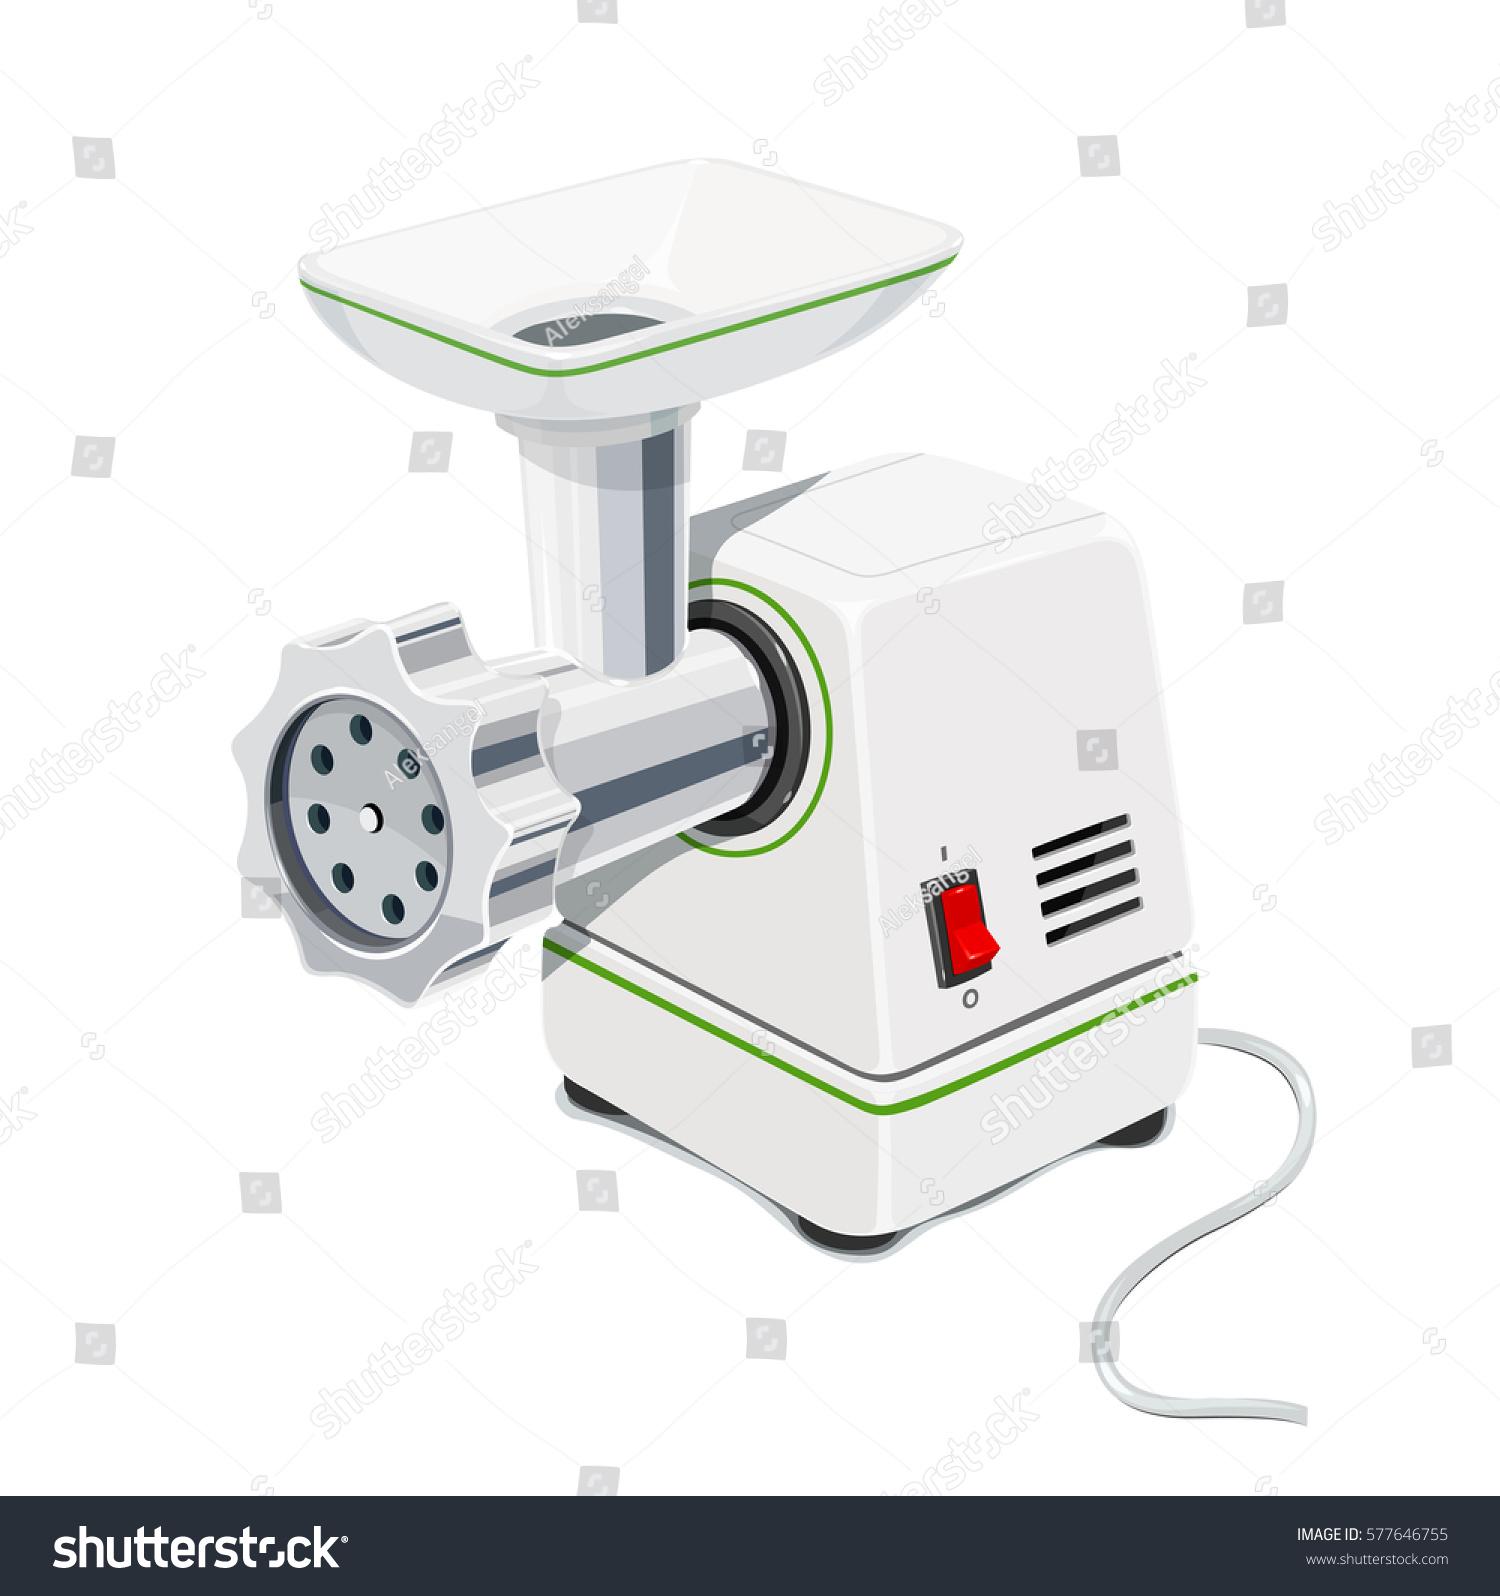 Electric Meat Grinder. Kitchen Equipment For Grind. Mincer Cooking Meal.  Pofessional Cook Instrument